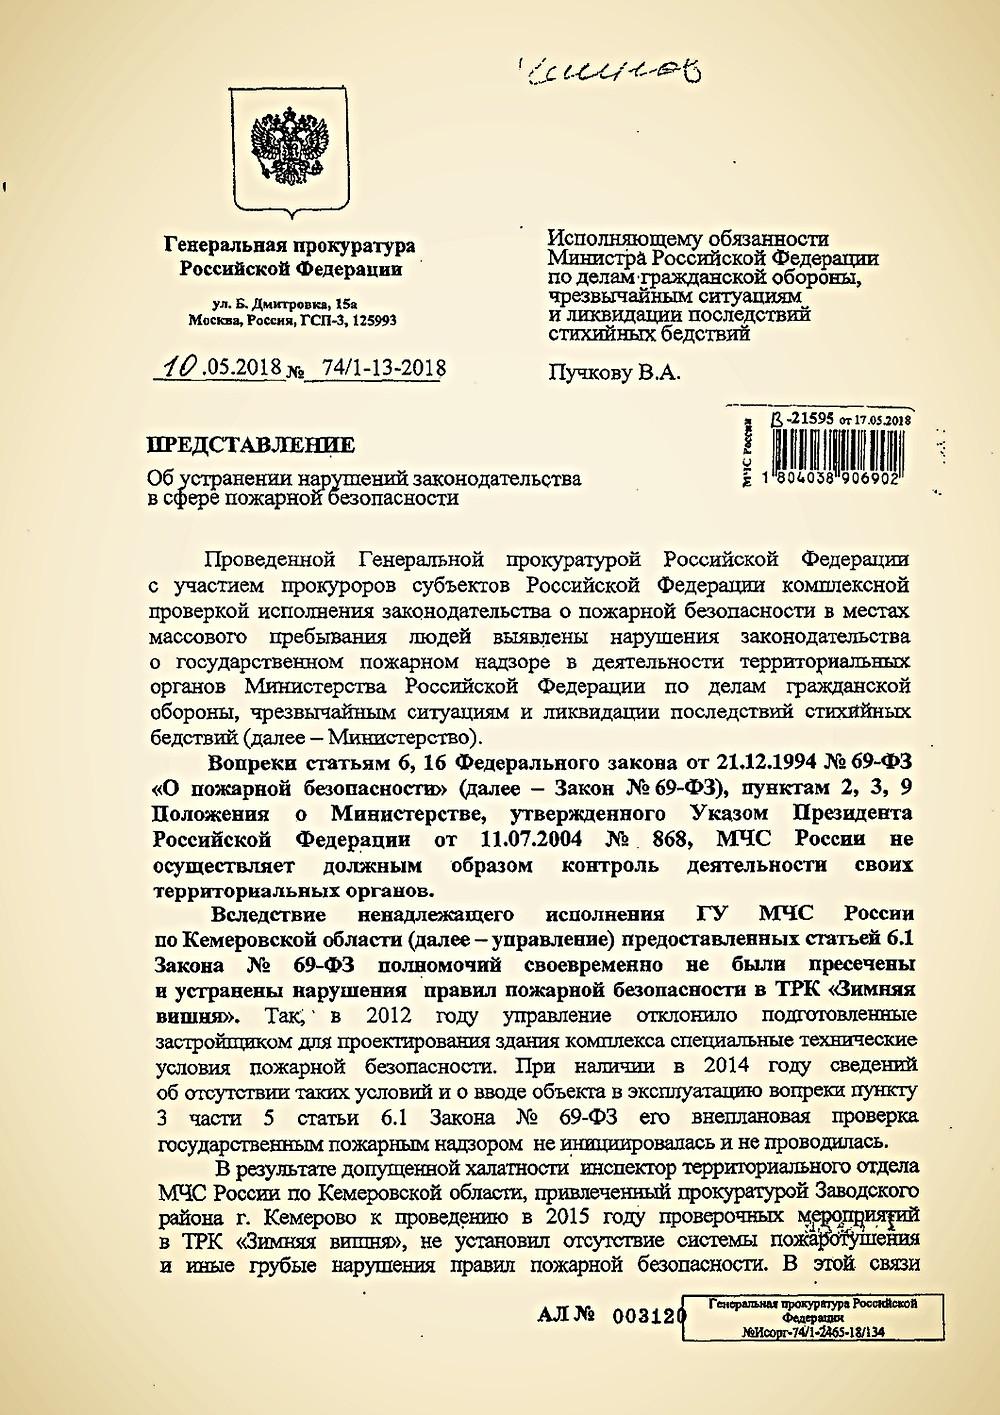 predstavlenie-generalnogo-prokurora-ot-10052018-ob-ustranenii-narushenij-v-sfere-zakonodatelstva-v-oblasti-pozharnoj-bezopasnosti